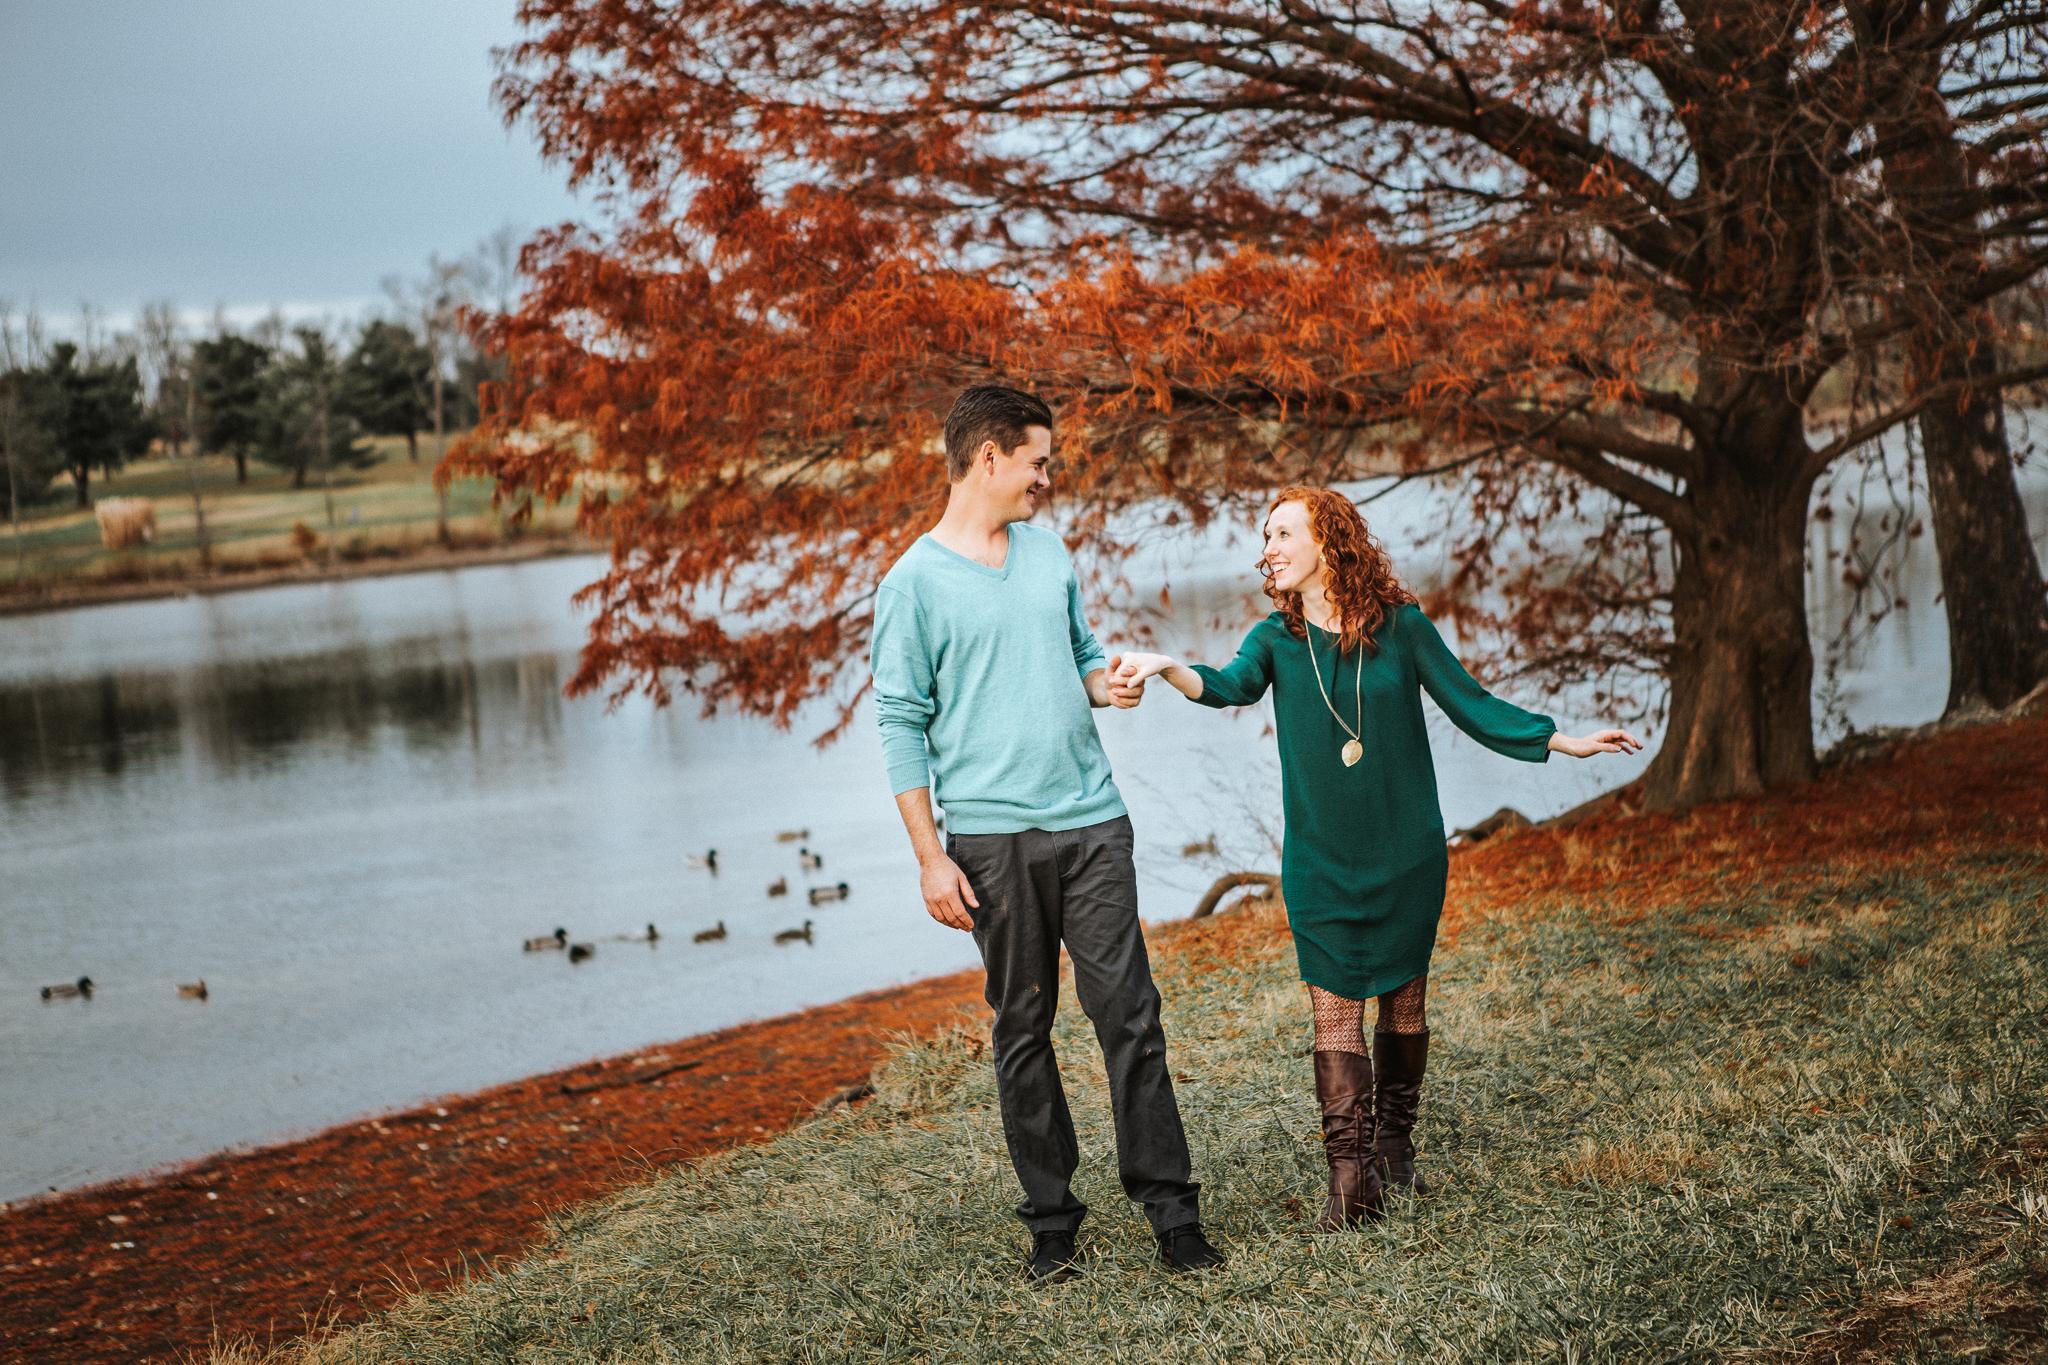 Richmond Kentucky Engagement Photographer - Ariana Jordan Photography -38.jpg